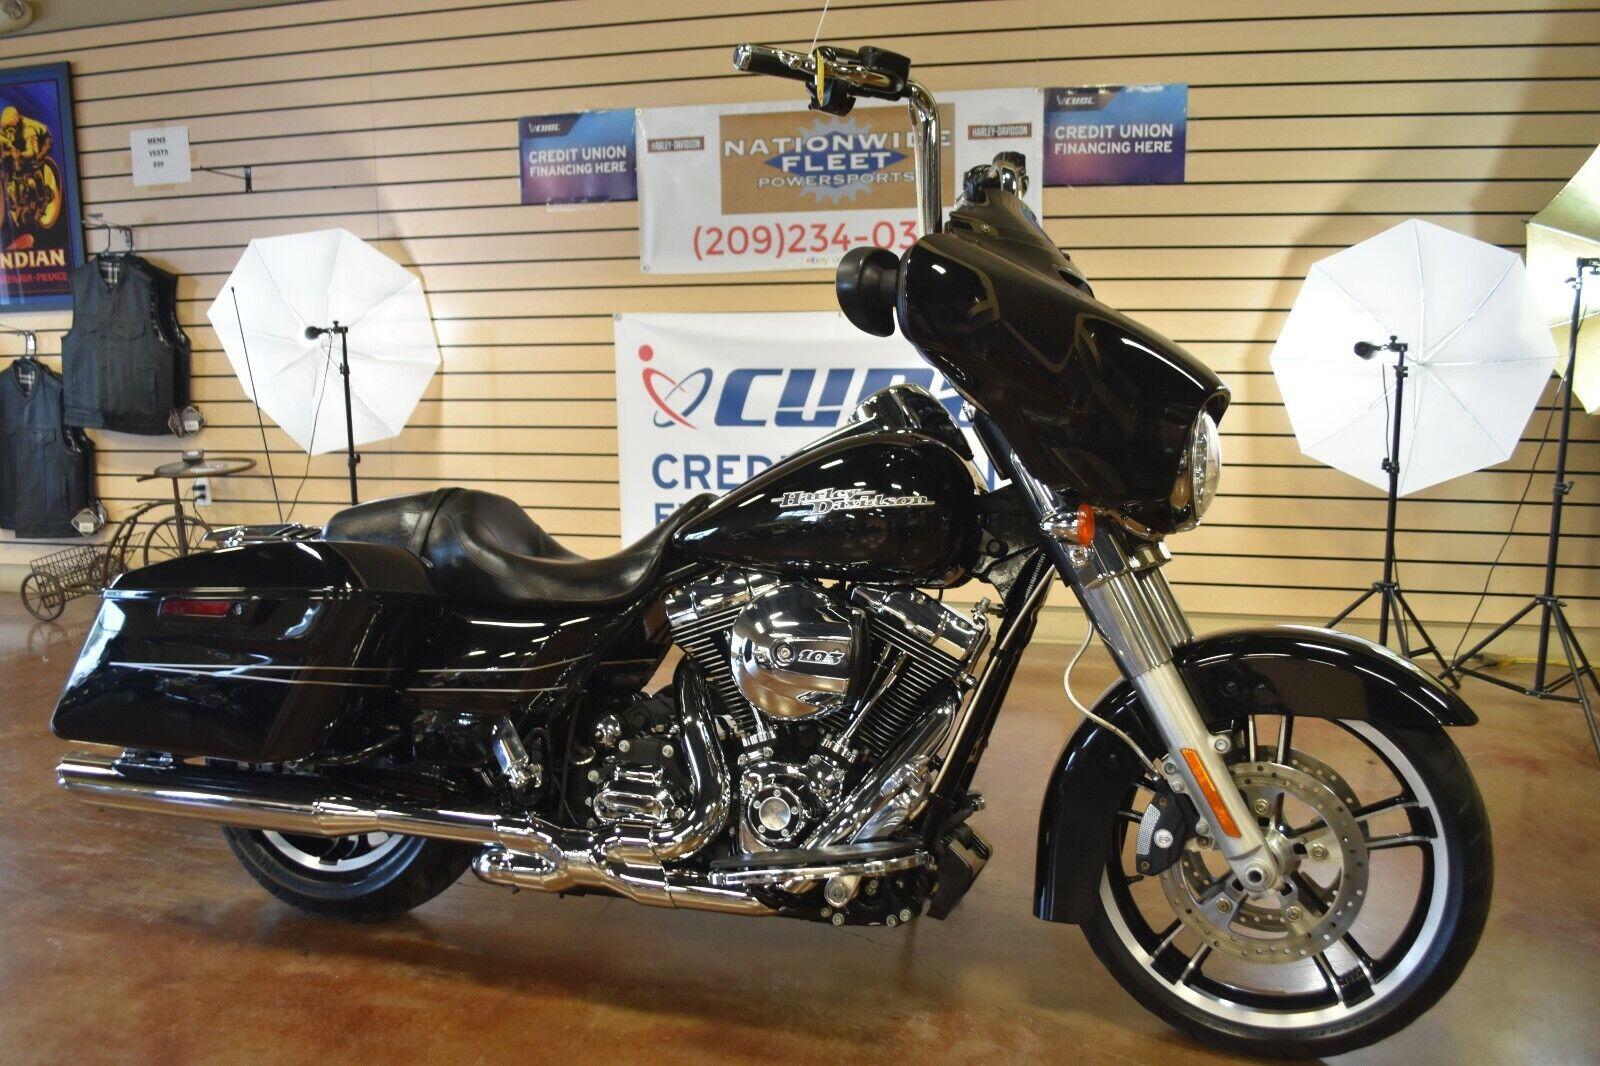 2014 Harley Davidson Street Glide FLHX 103 Touring Bagger Clean Title NO RESERVE